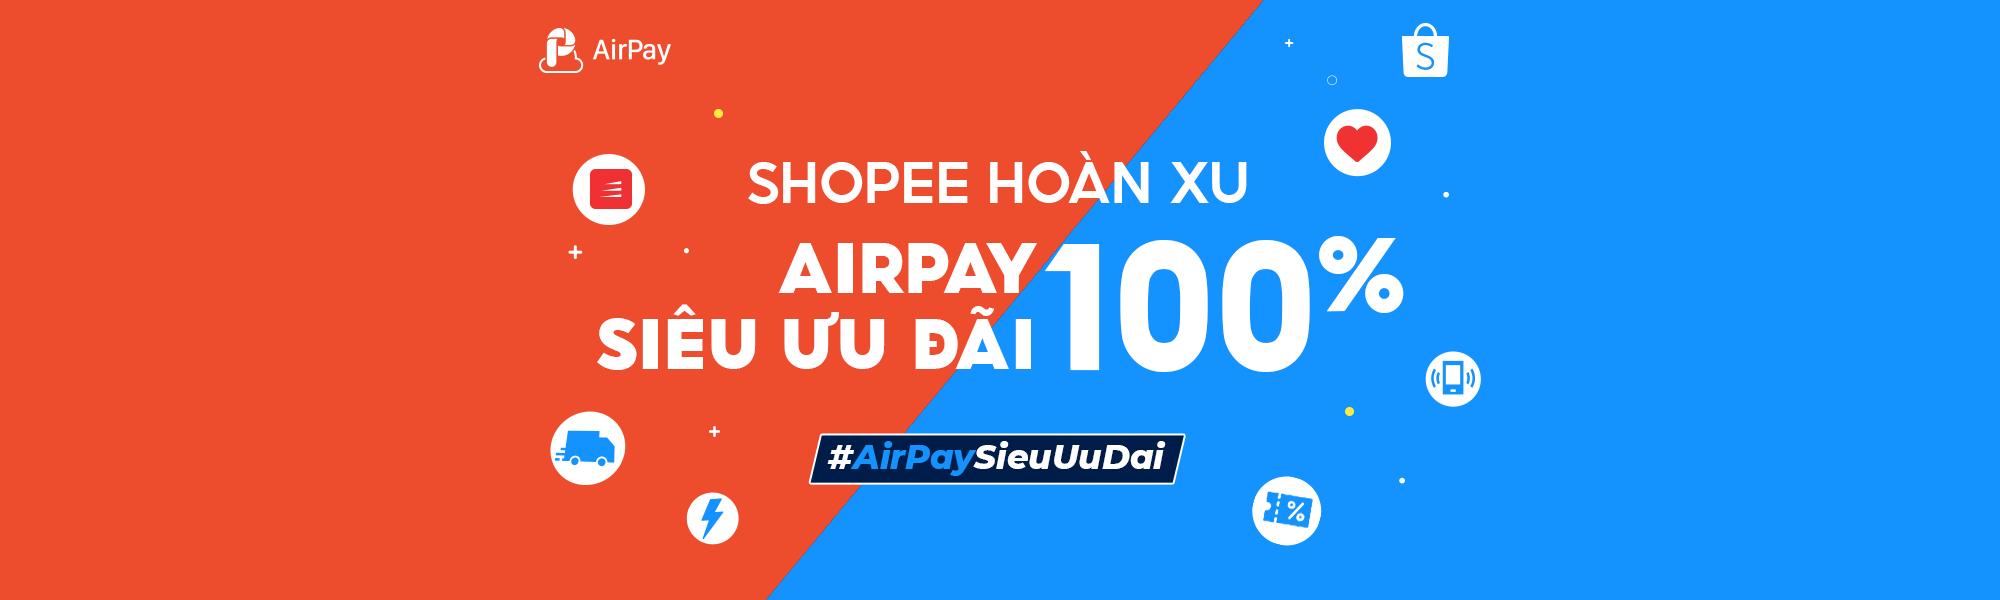 khuyến mãi airpay shopee